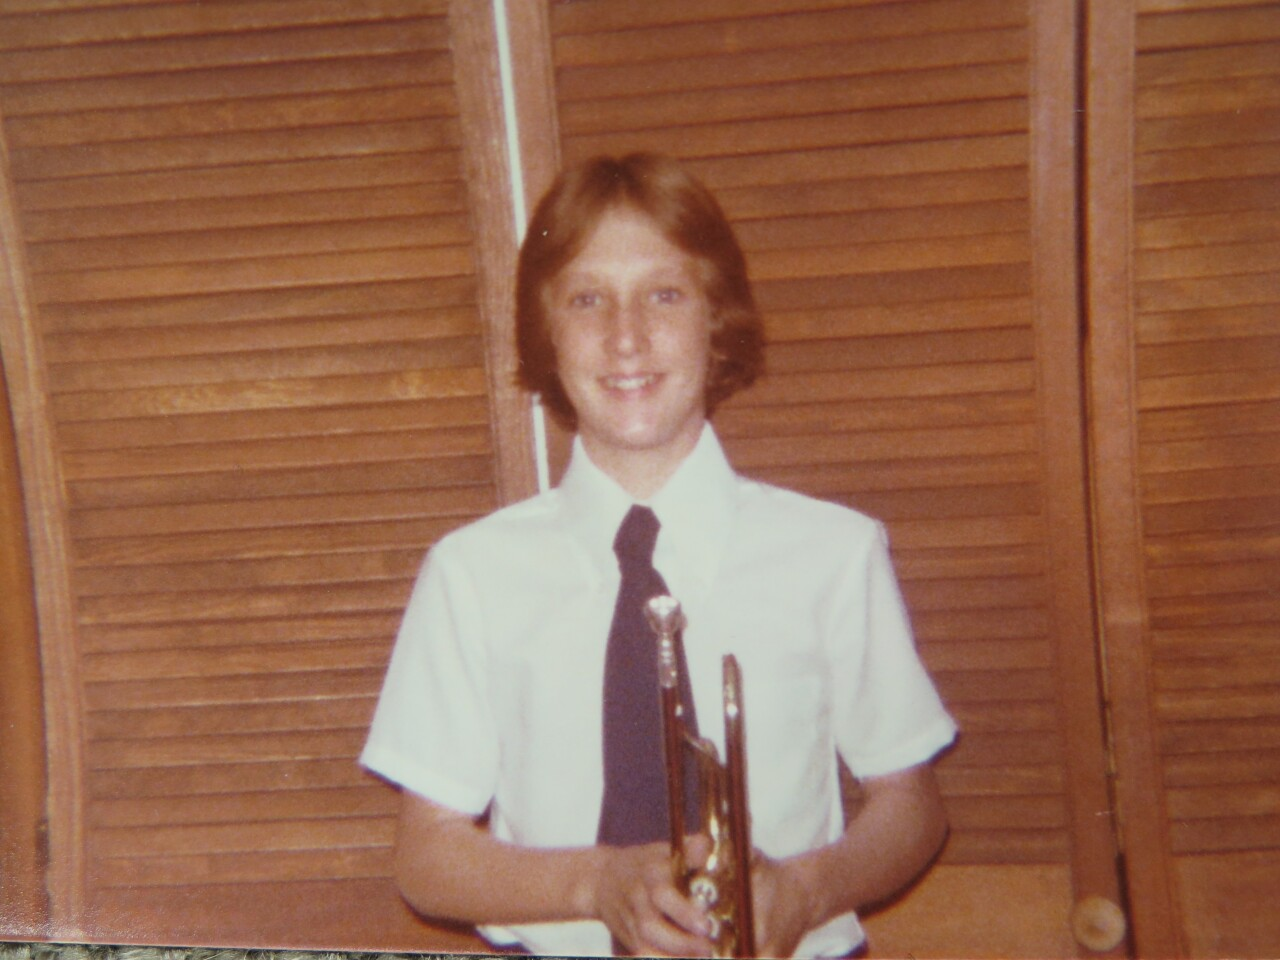 Scott_Noel_with_trumpet.JPG